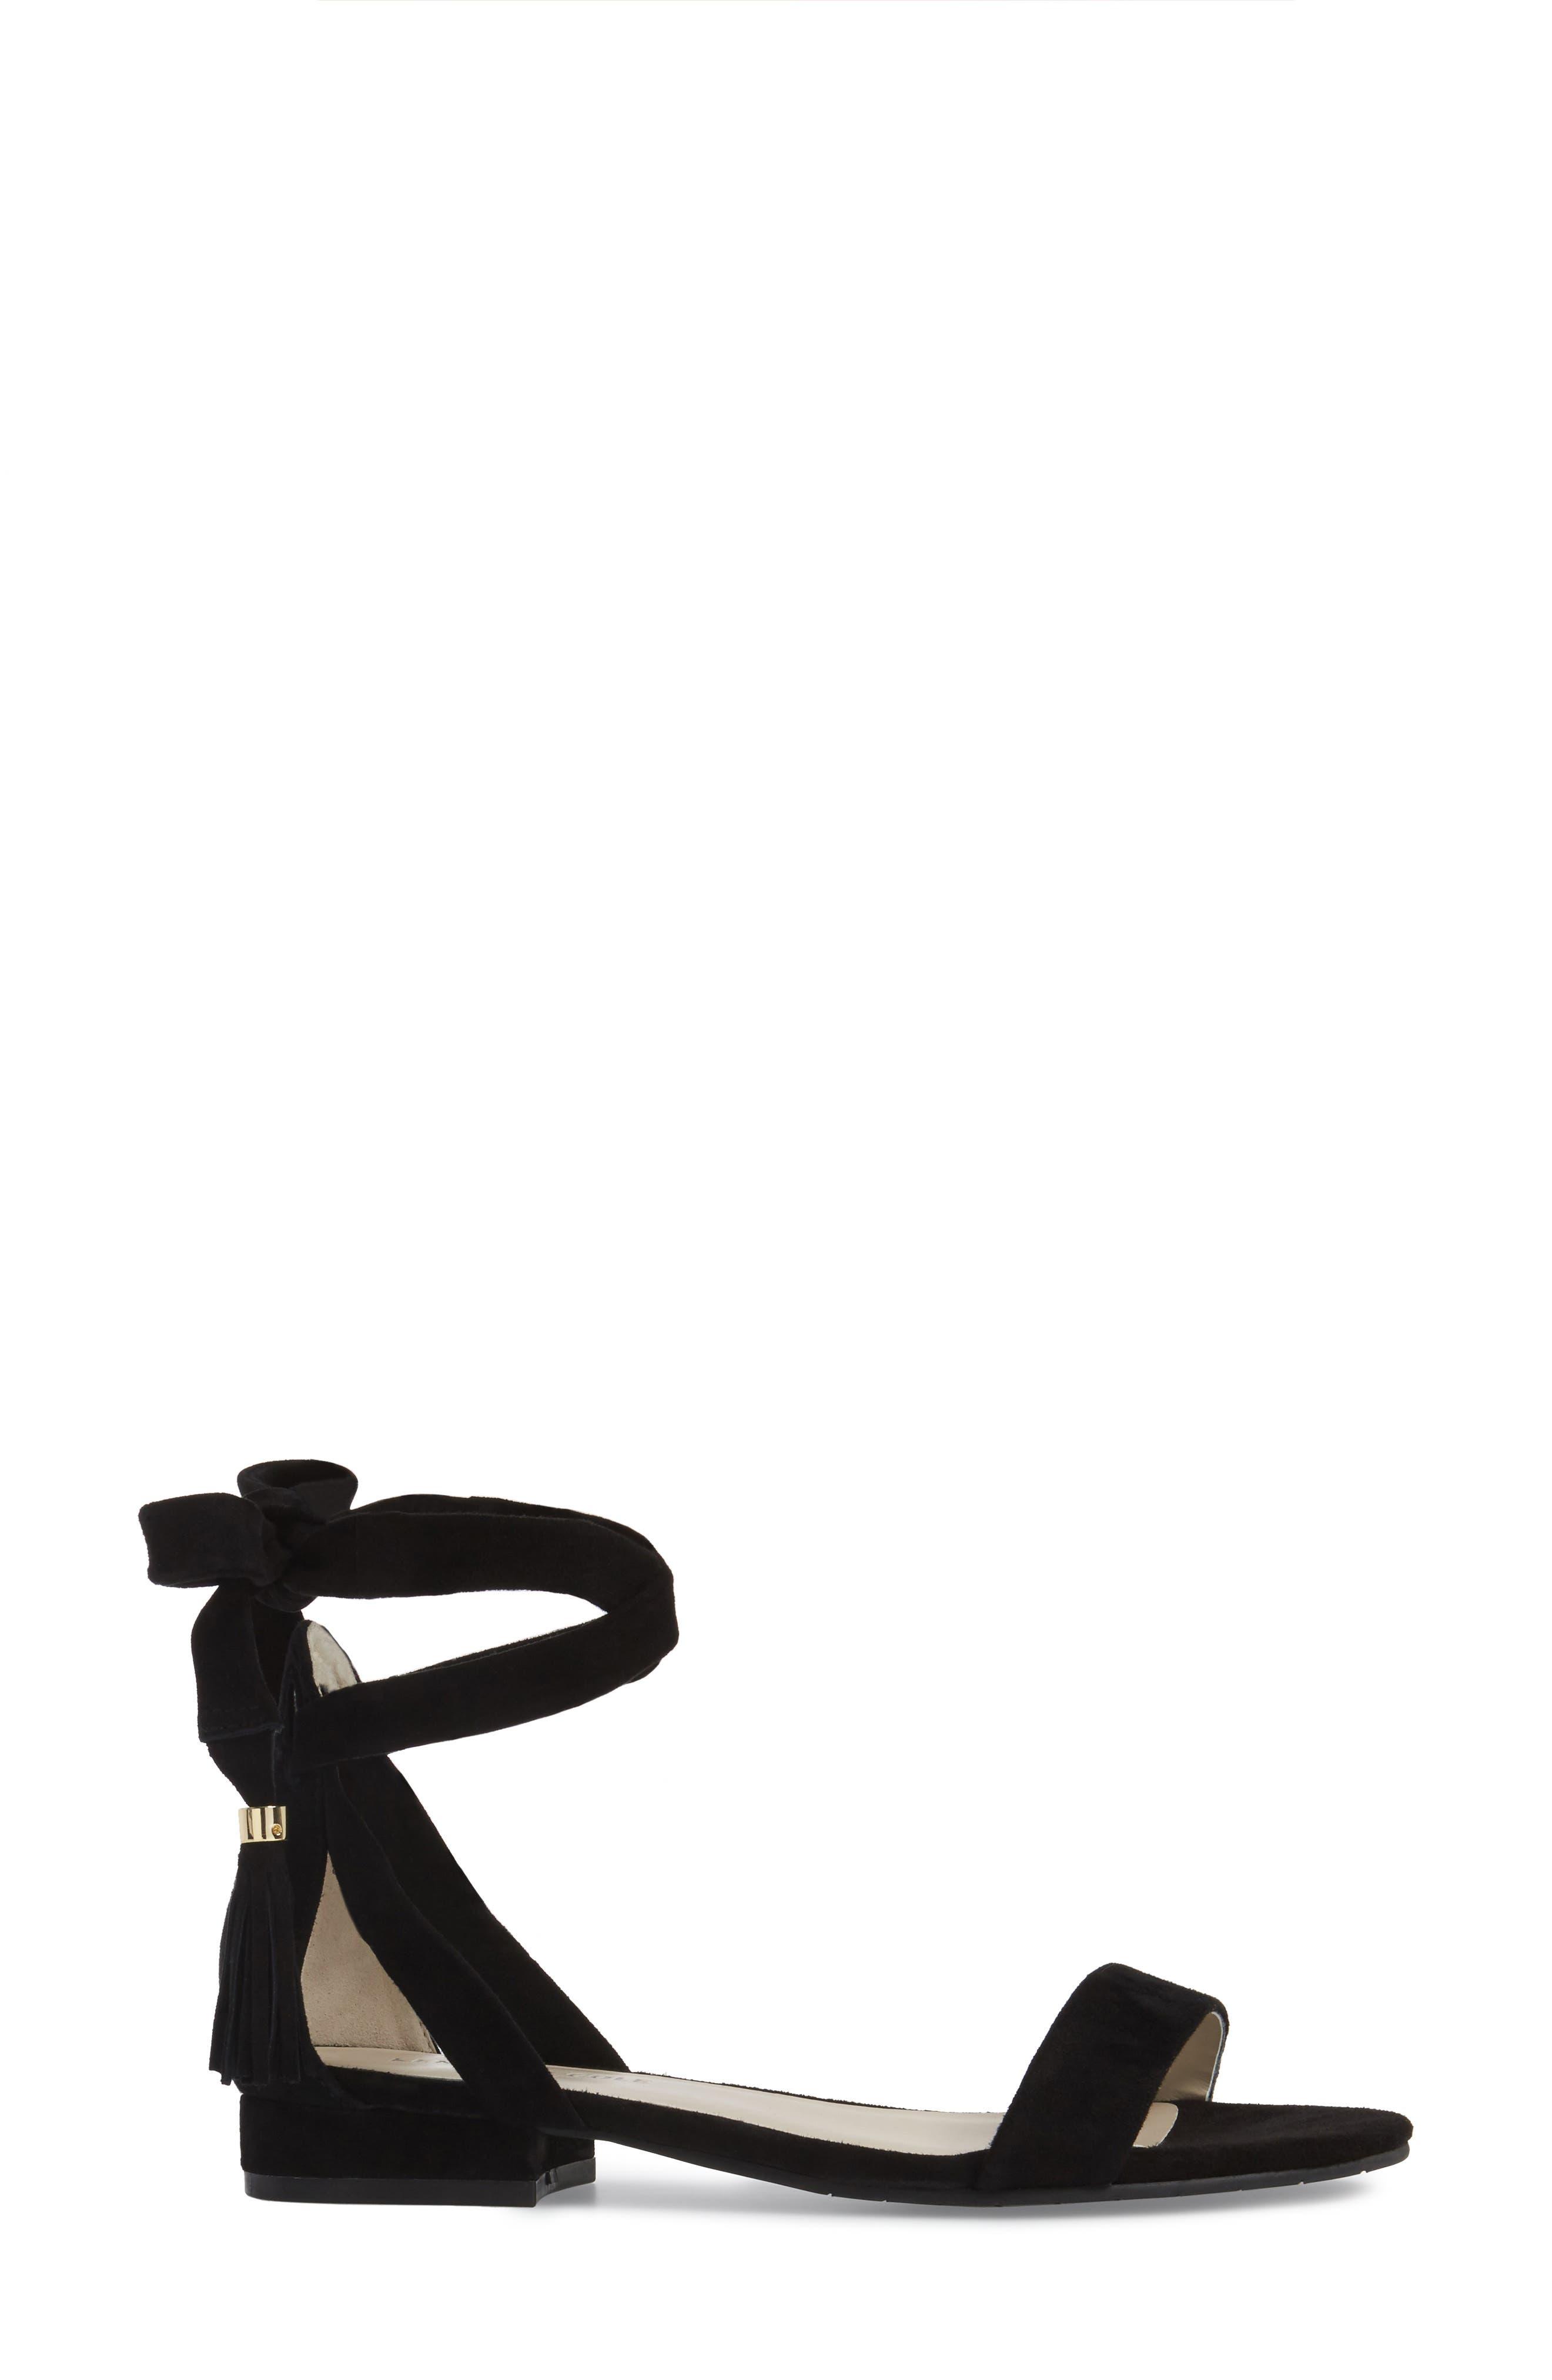 Valen Tassel Lace-Up Sandal,                             Alternate thumbnail 3, color,                             Black Suede